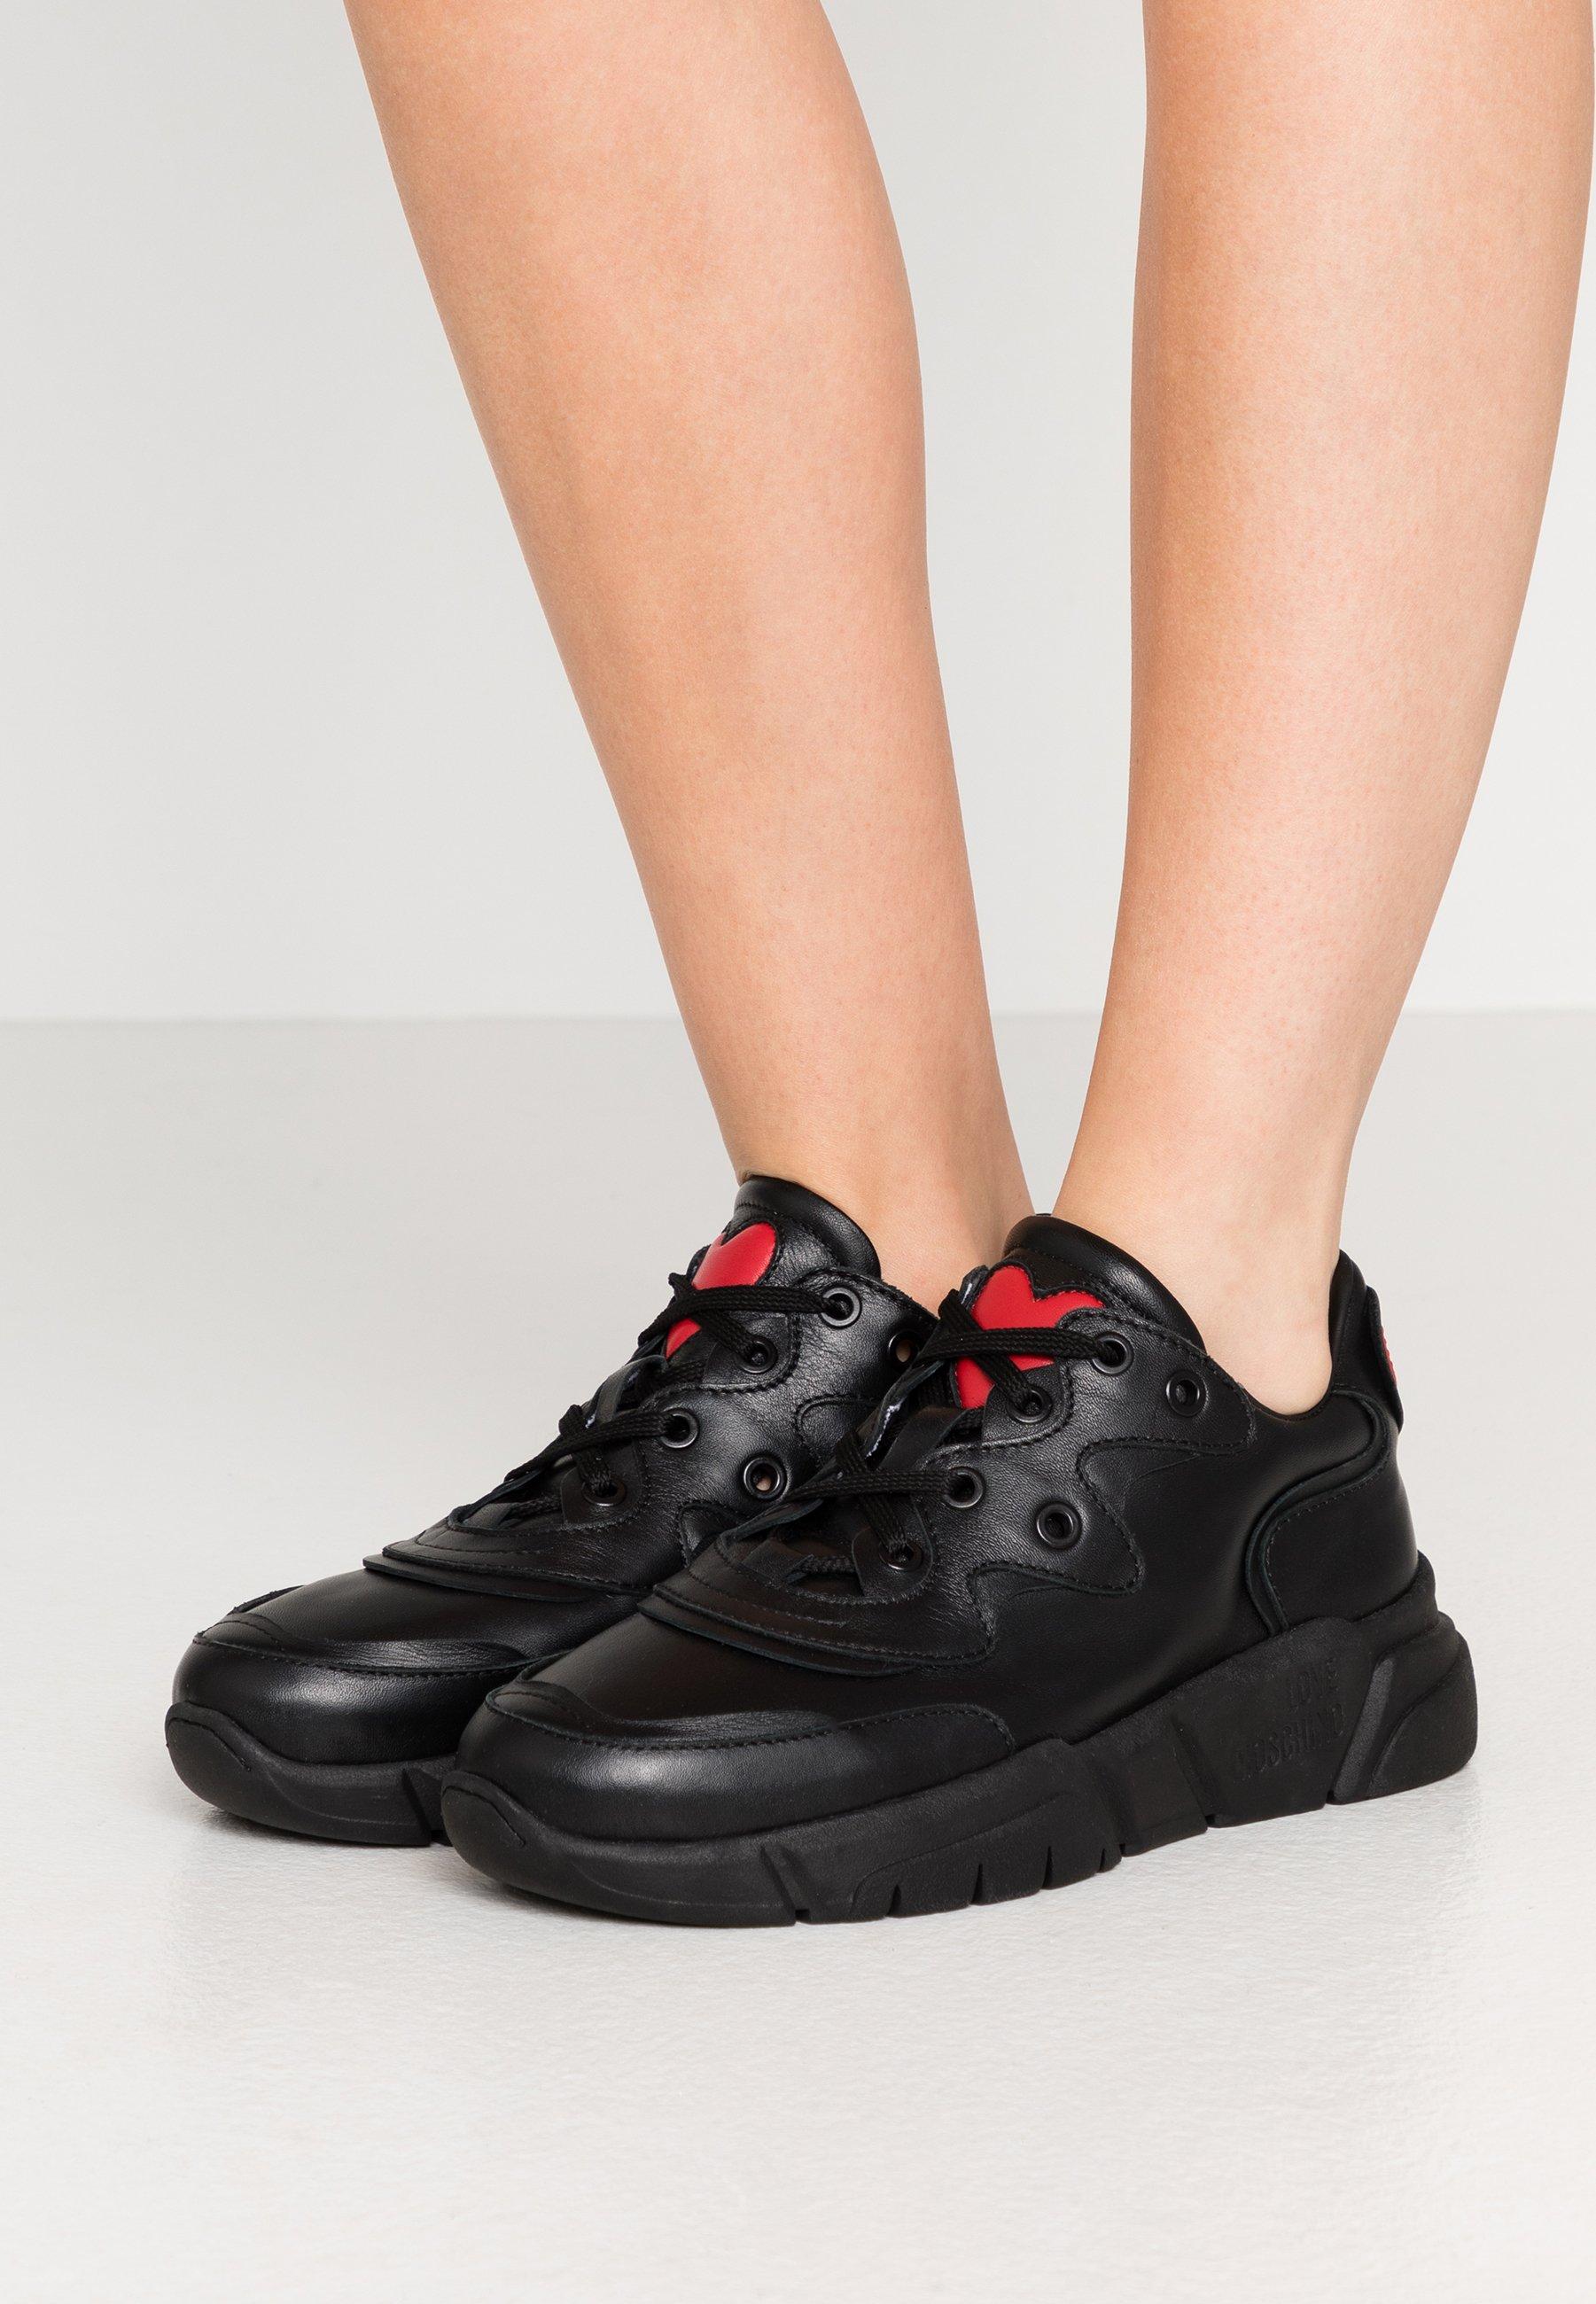 NEW LOVE RUNNING Sneakers black